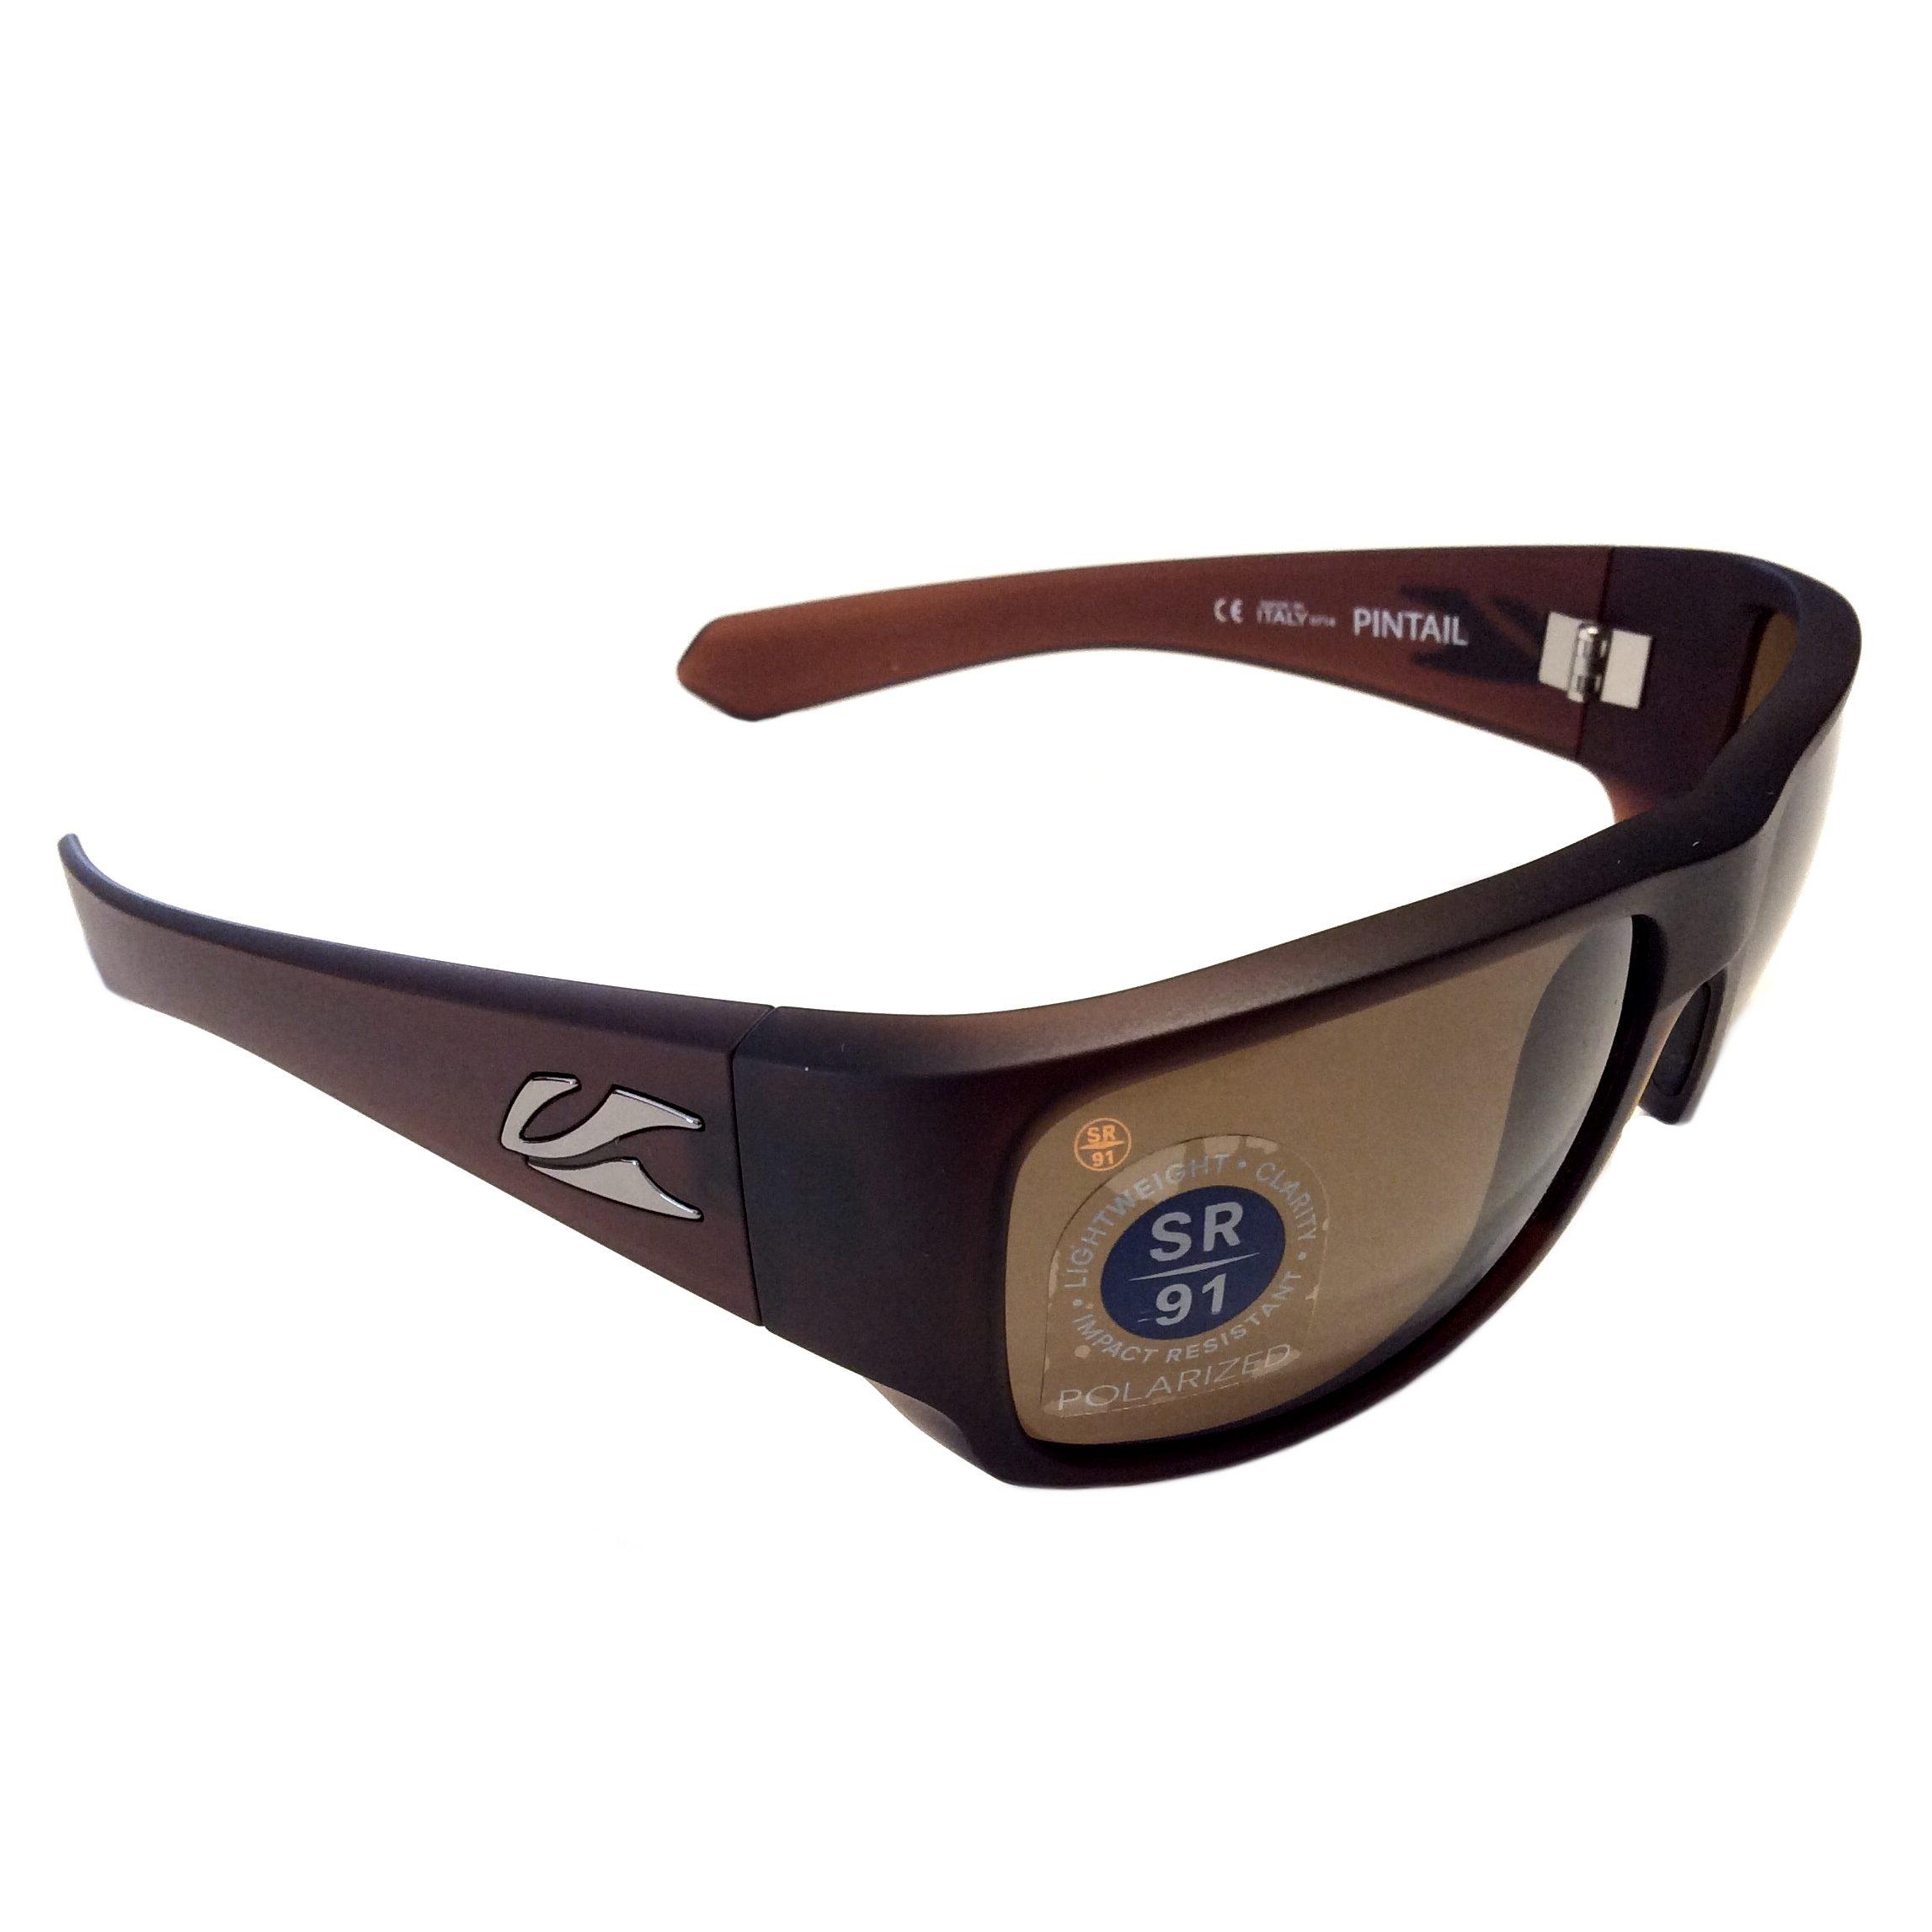 e4002154fa69 Kaenon Rhino Polarized Sunglasses Review « Heritage Malta